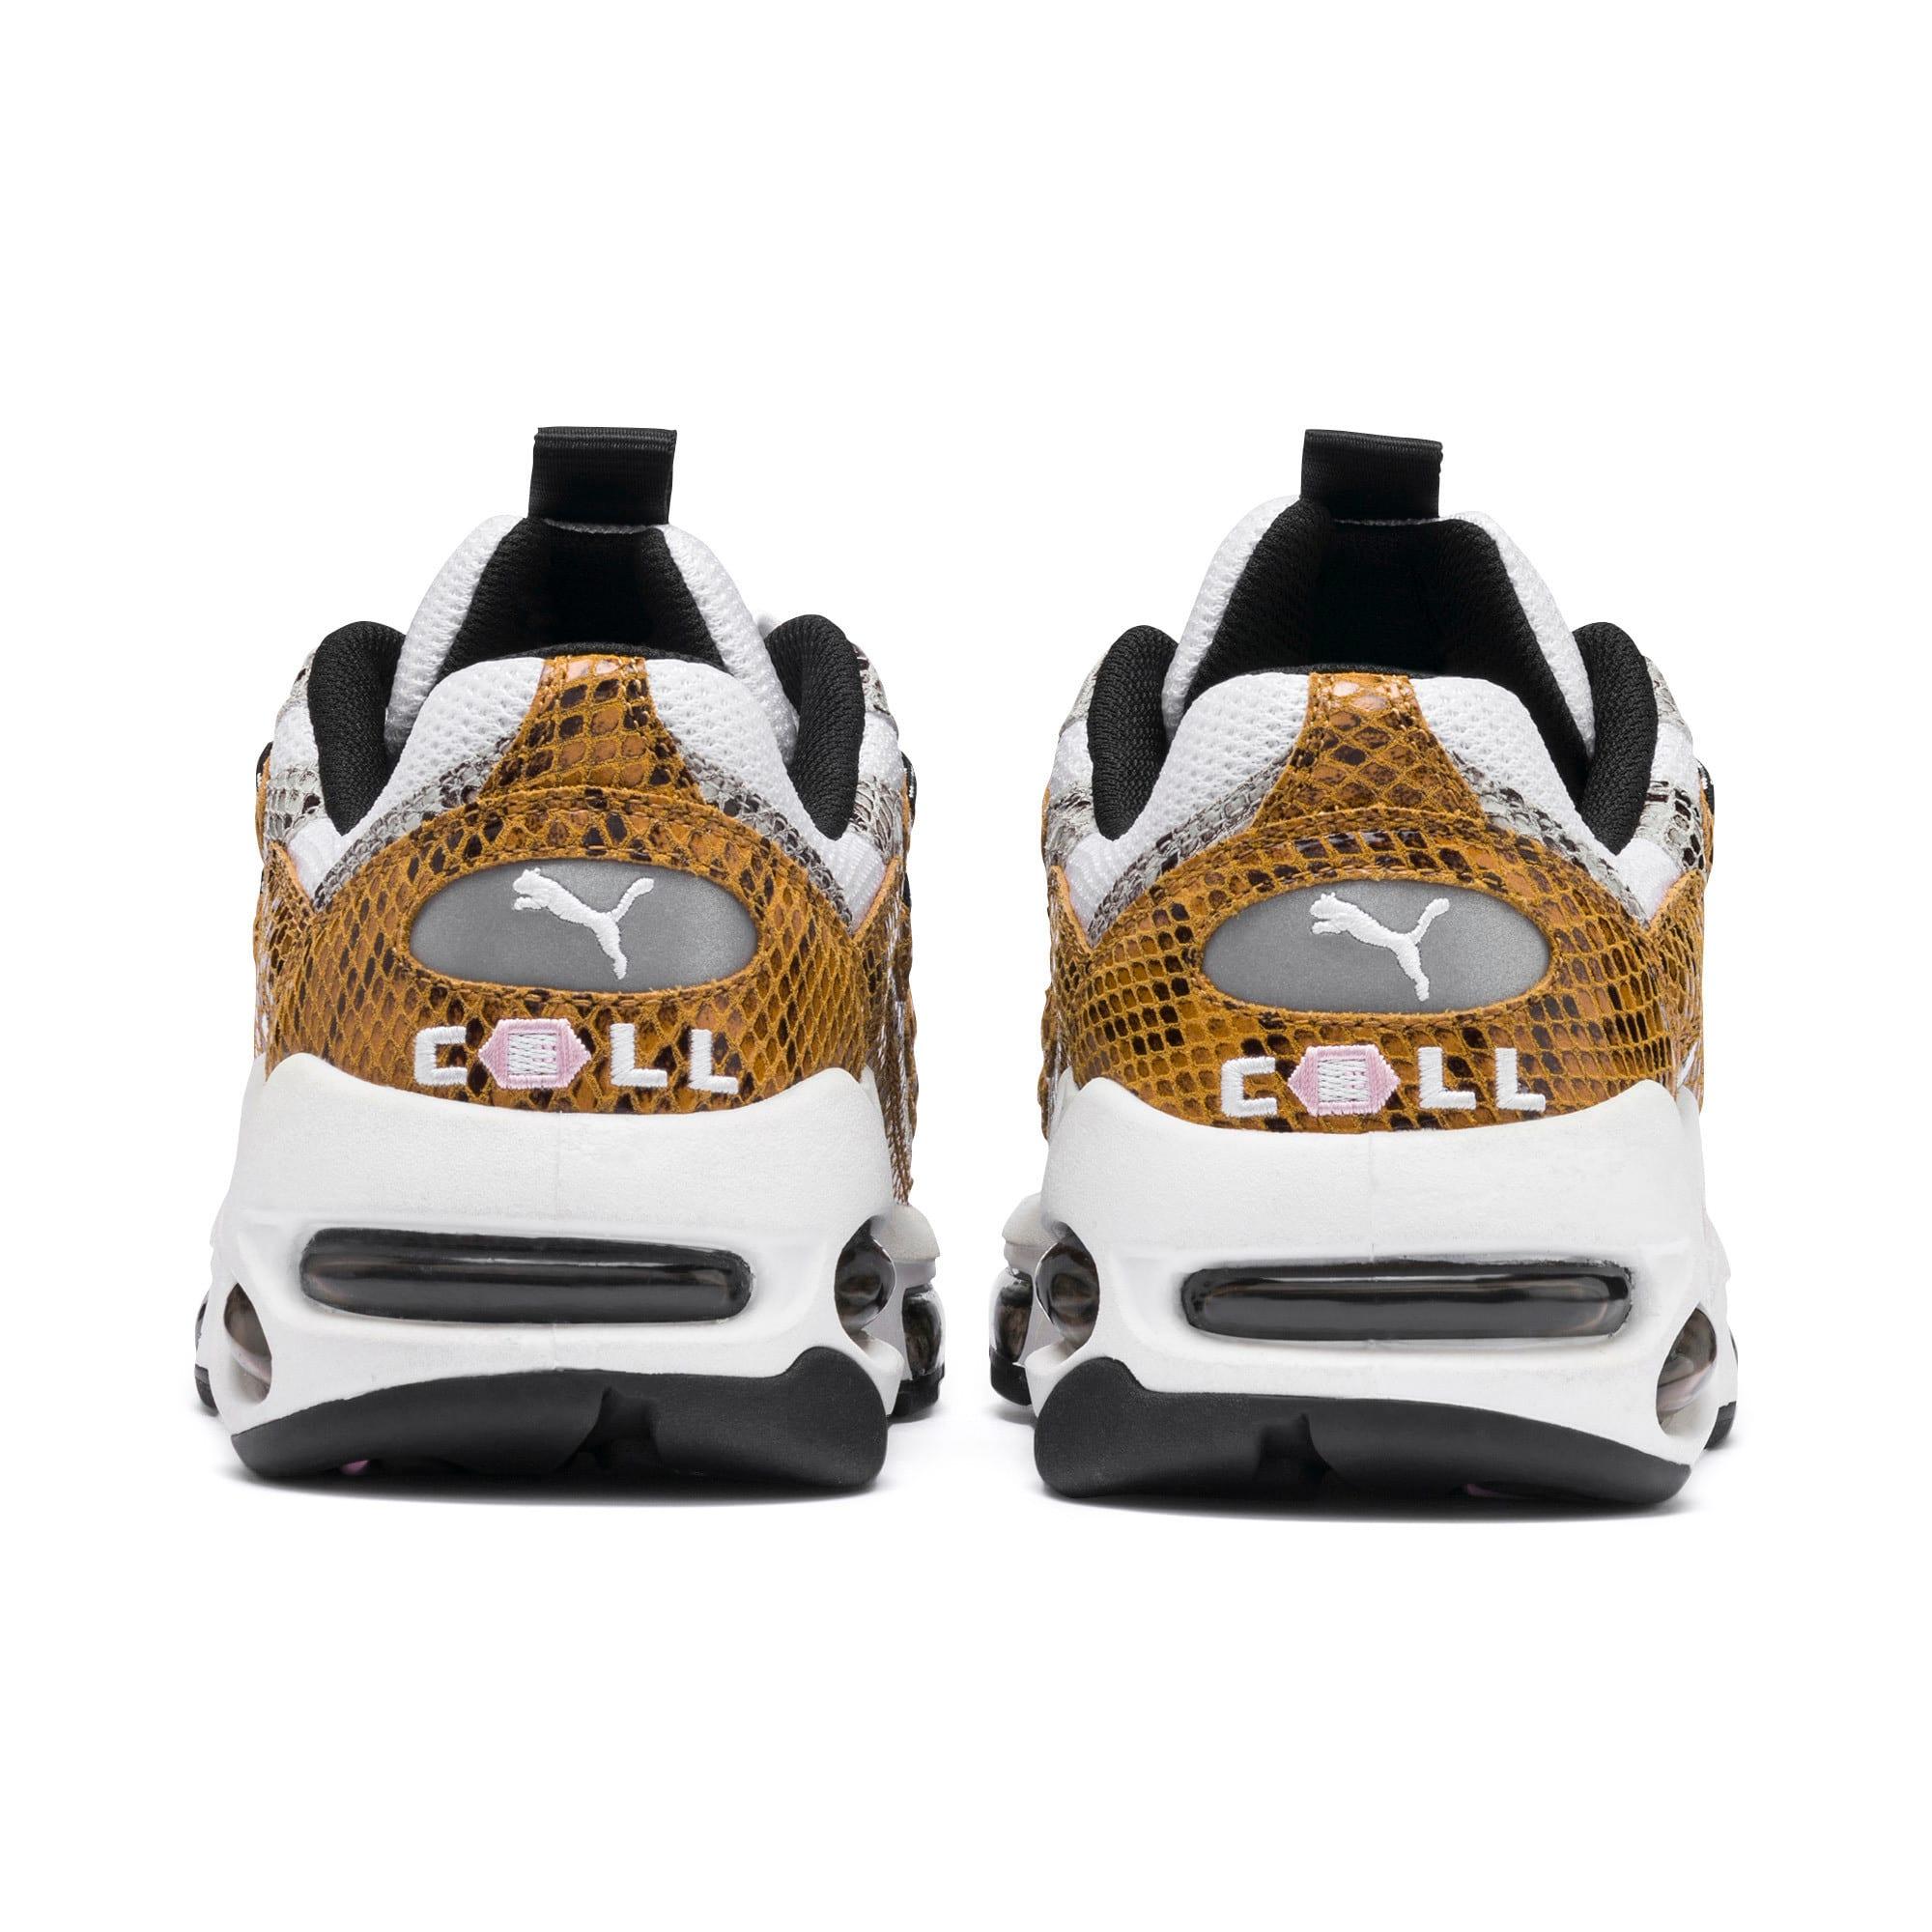 Thumbnail 4 of CELL Endura Animal Kingdom Sneakers, Puma White-Golden Orange, medium